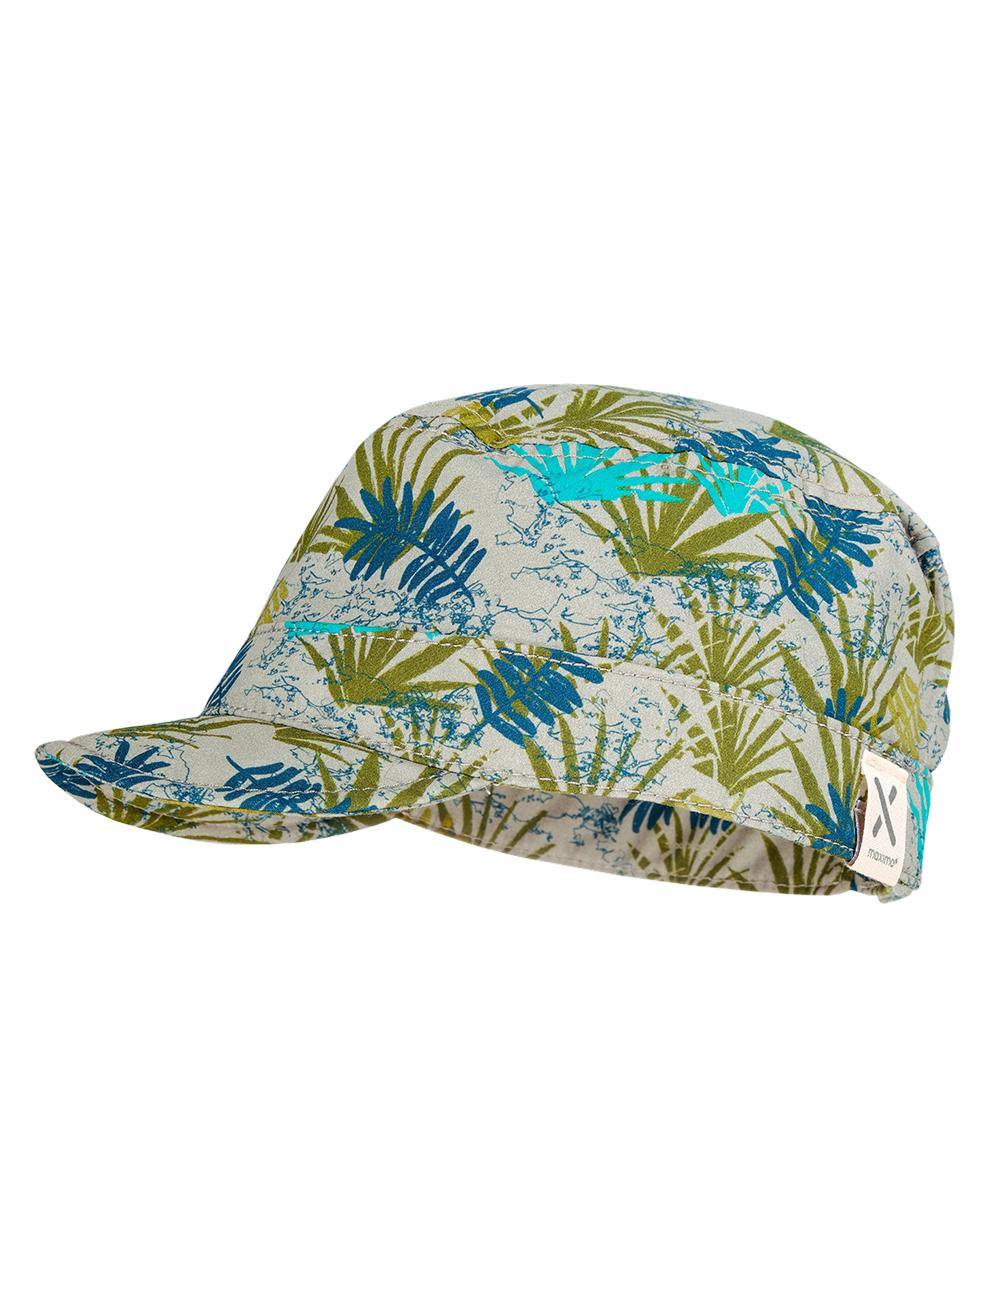 BOY-Cap 51 Maximo. Farbe: sand-grün-palmenblätter, Größe: 51